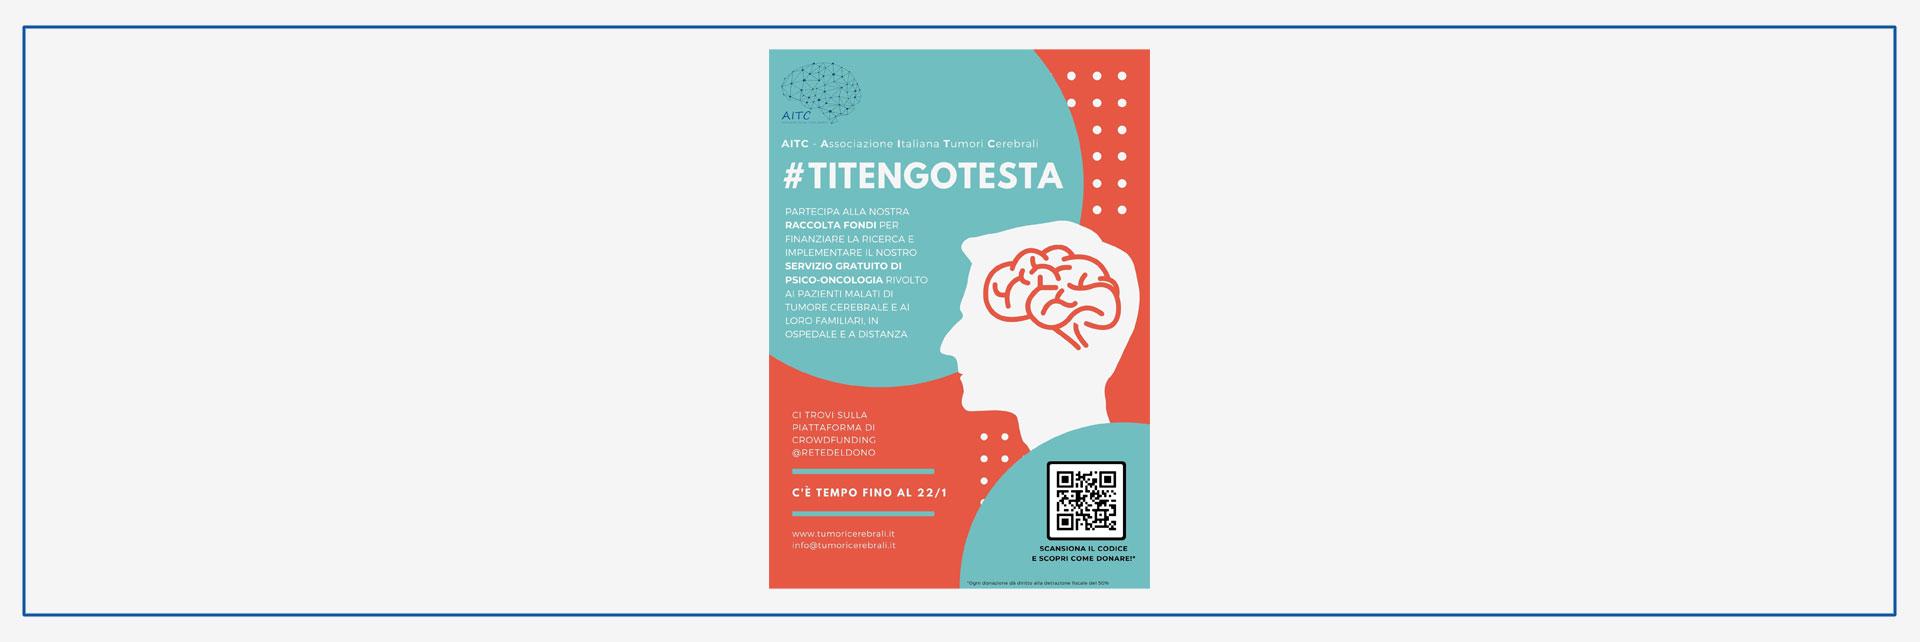 #TITENGOINTESTA